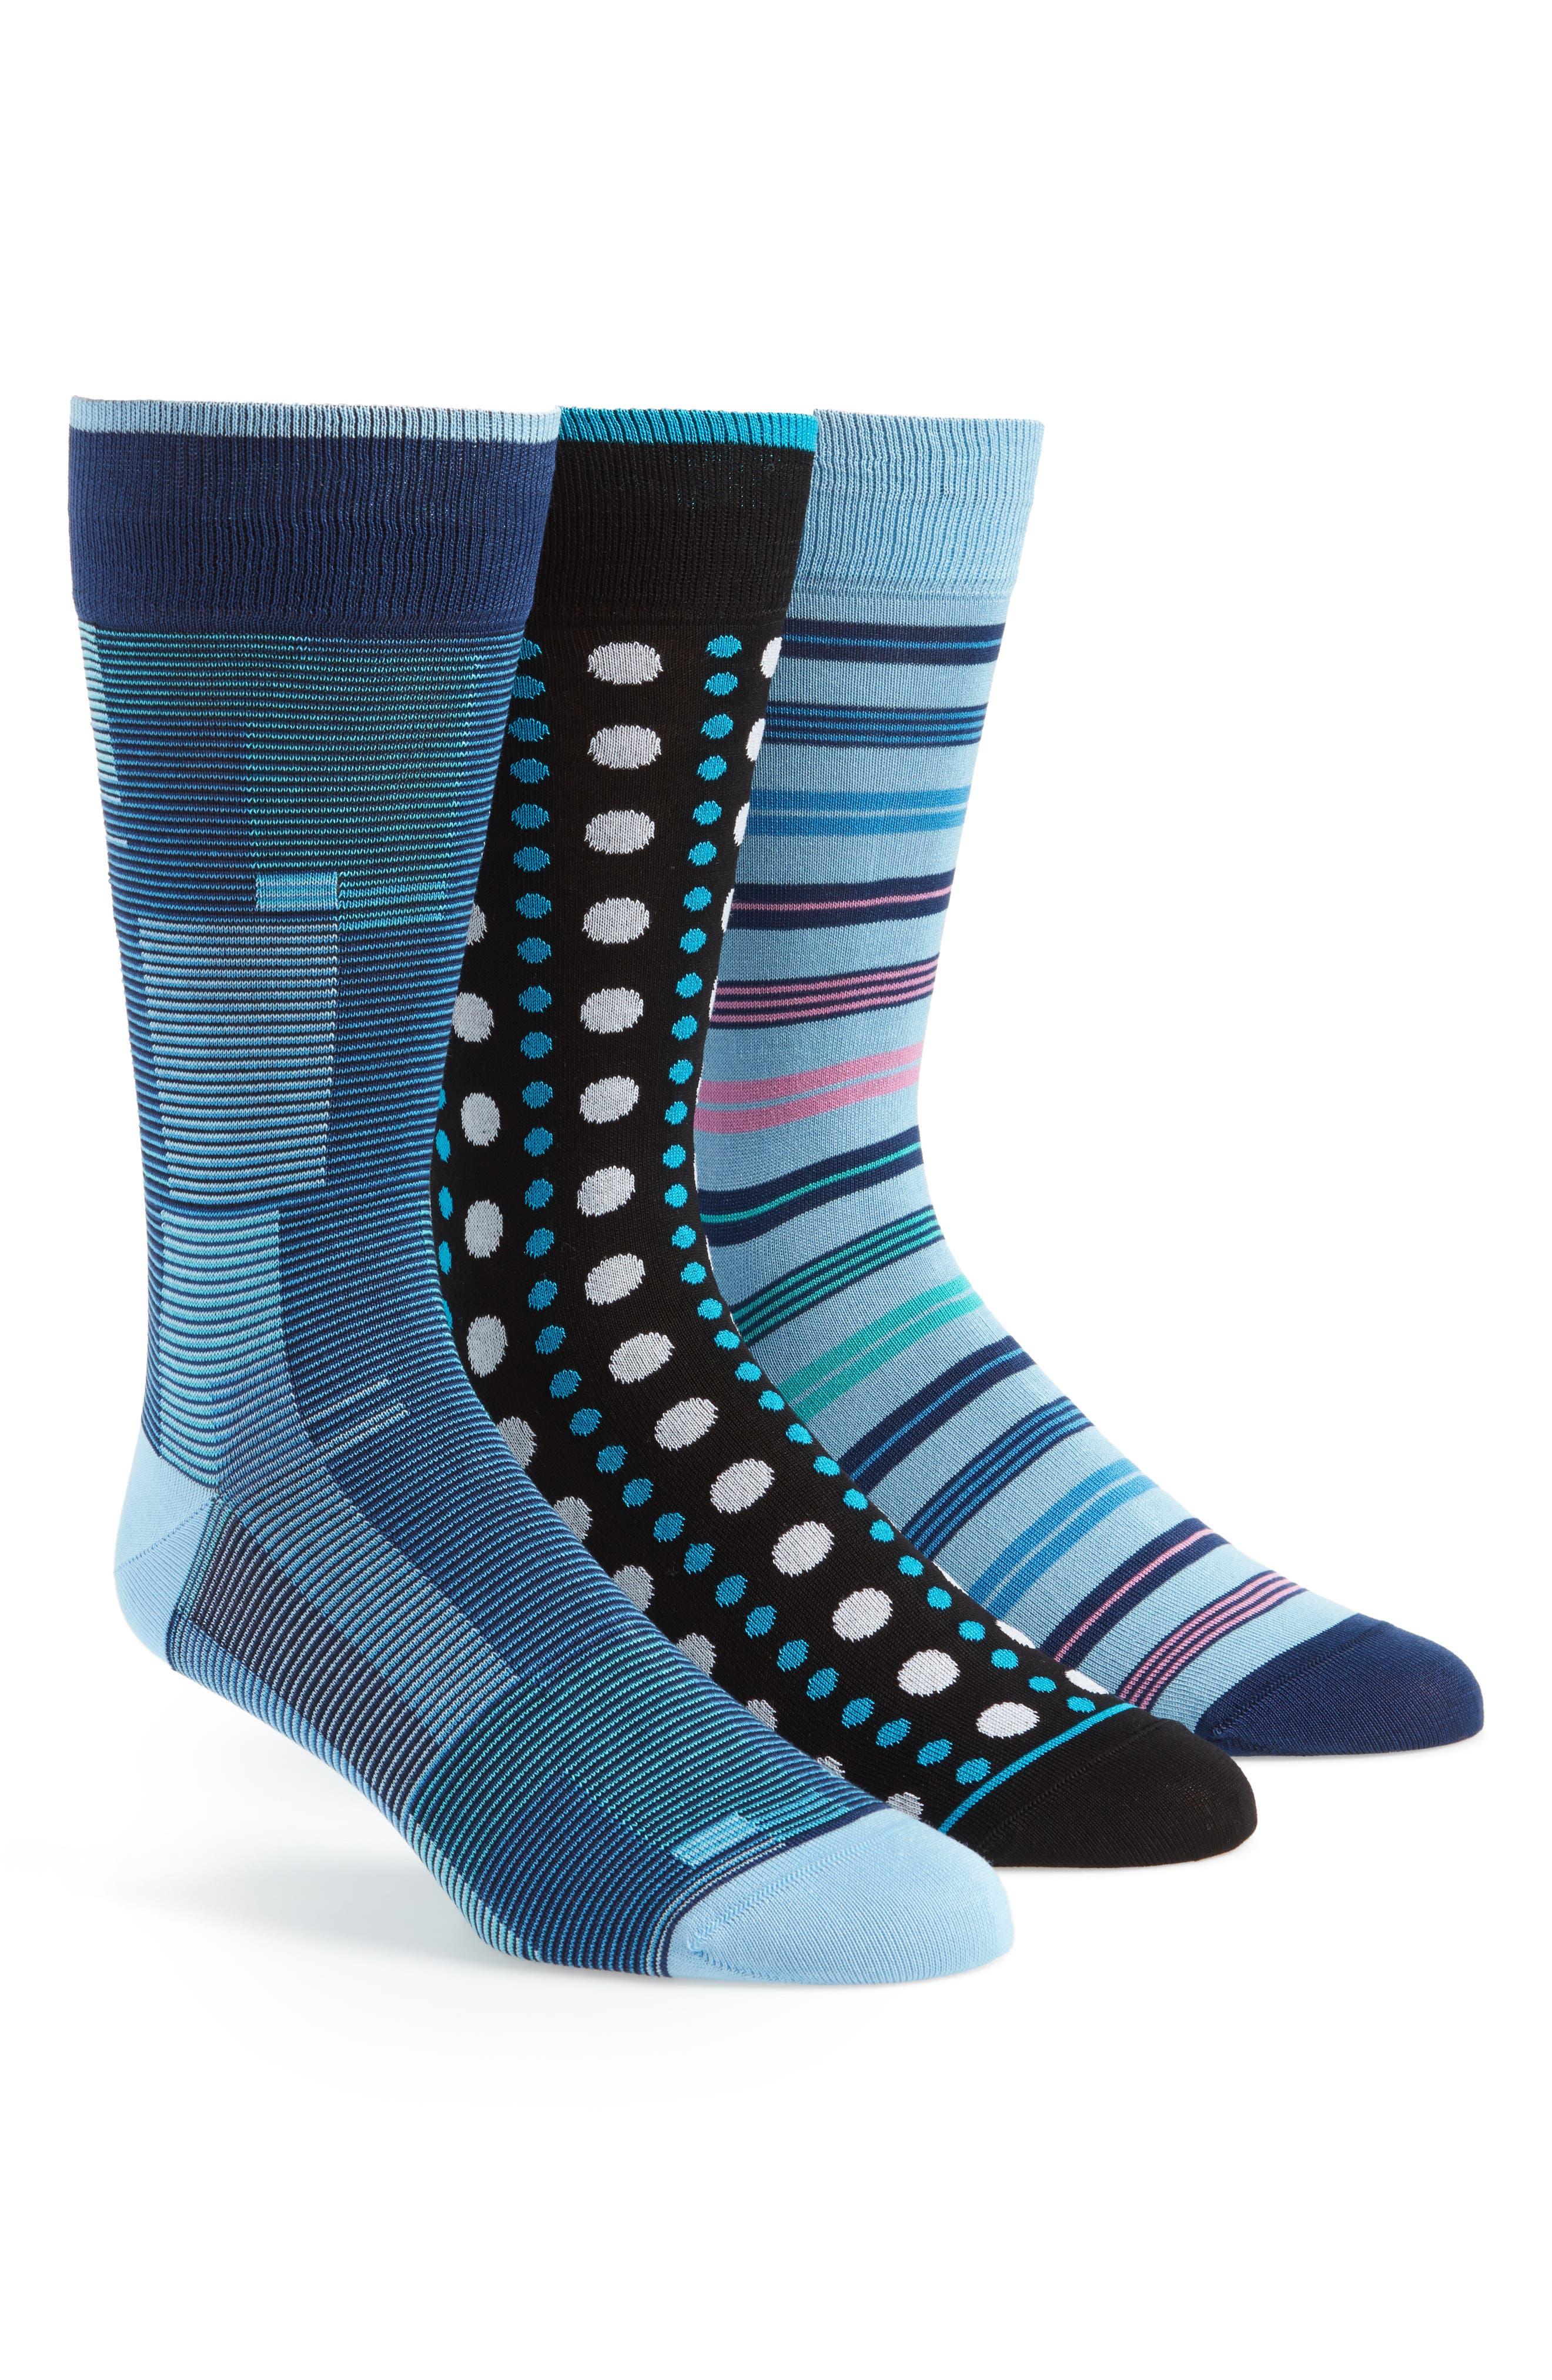 Bugatchi 3-Pack Assorted Mercerized Cotton Blend Sock Gift Set